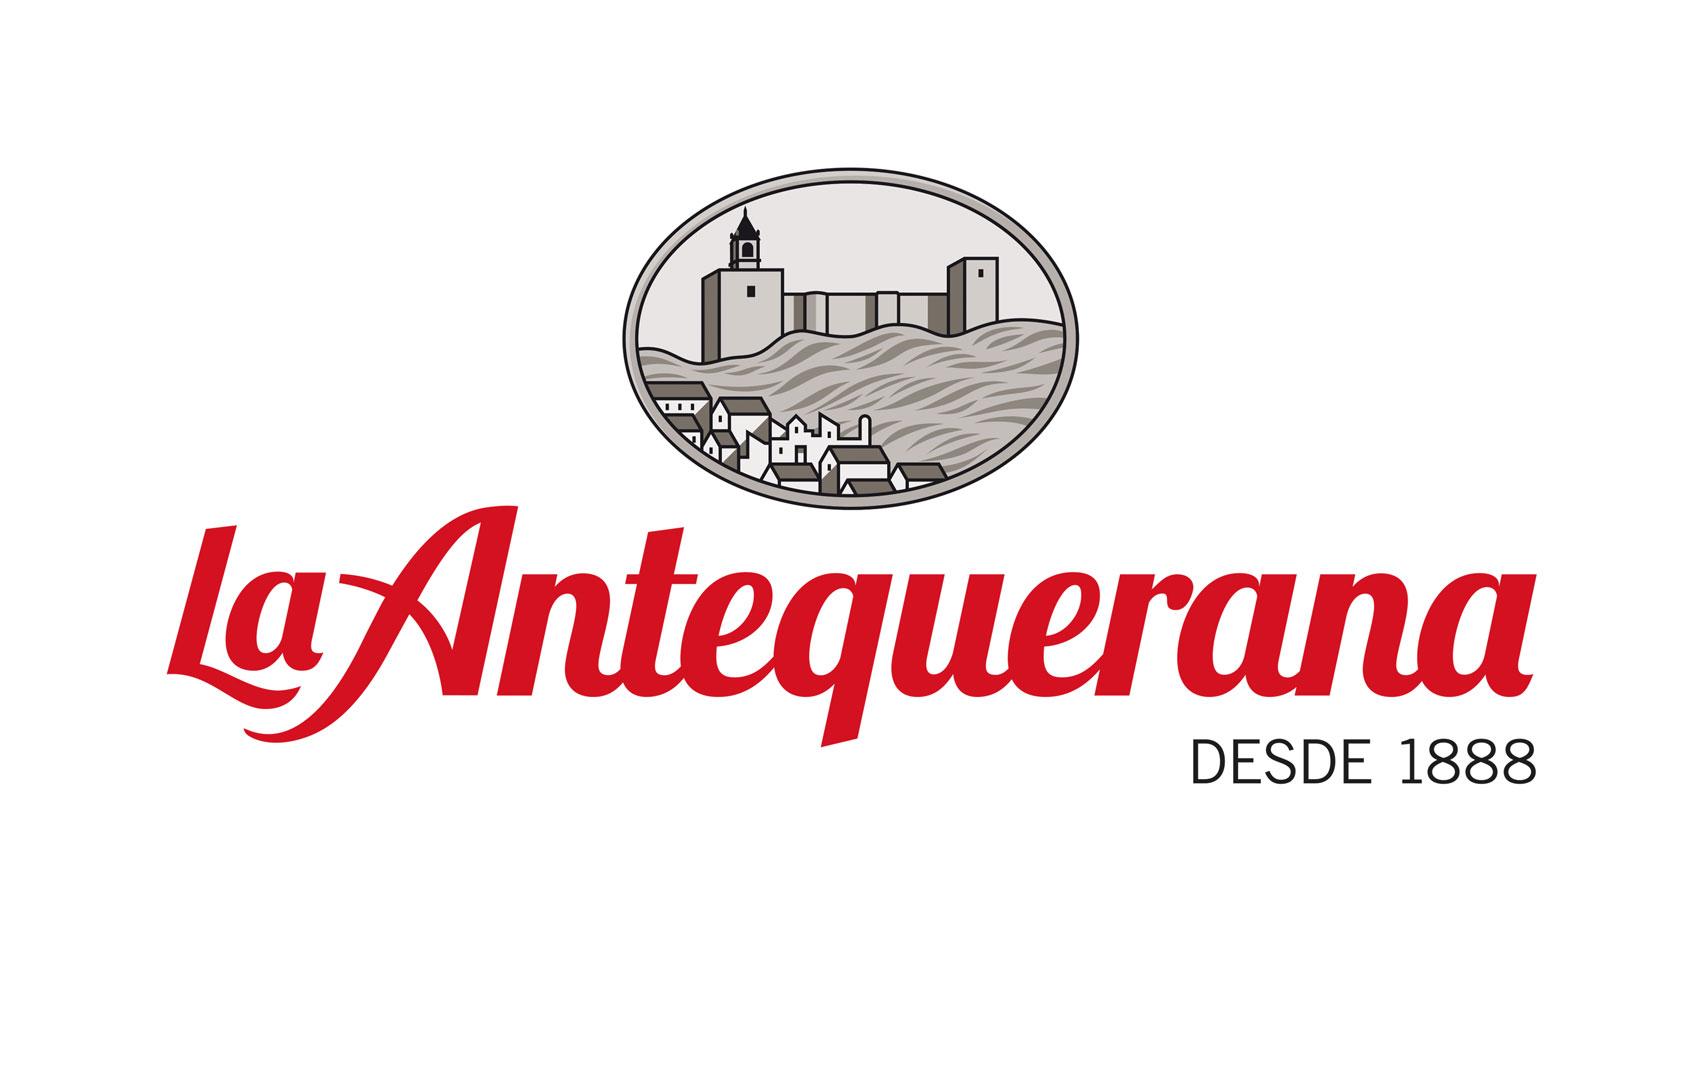 ident-lanatequerana-04.jpg